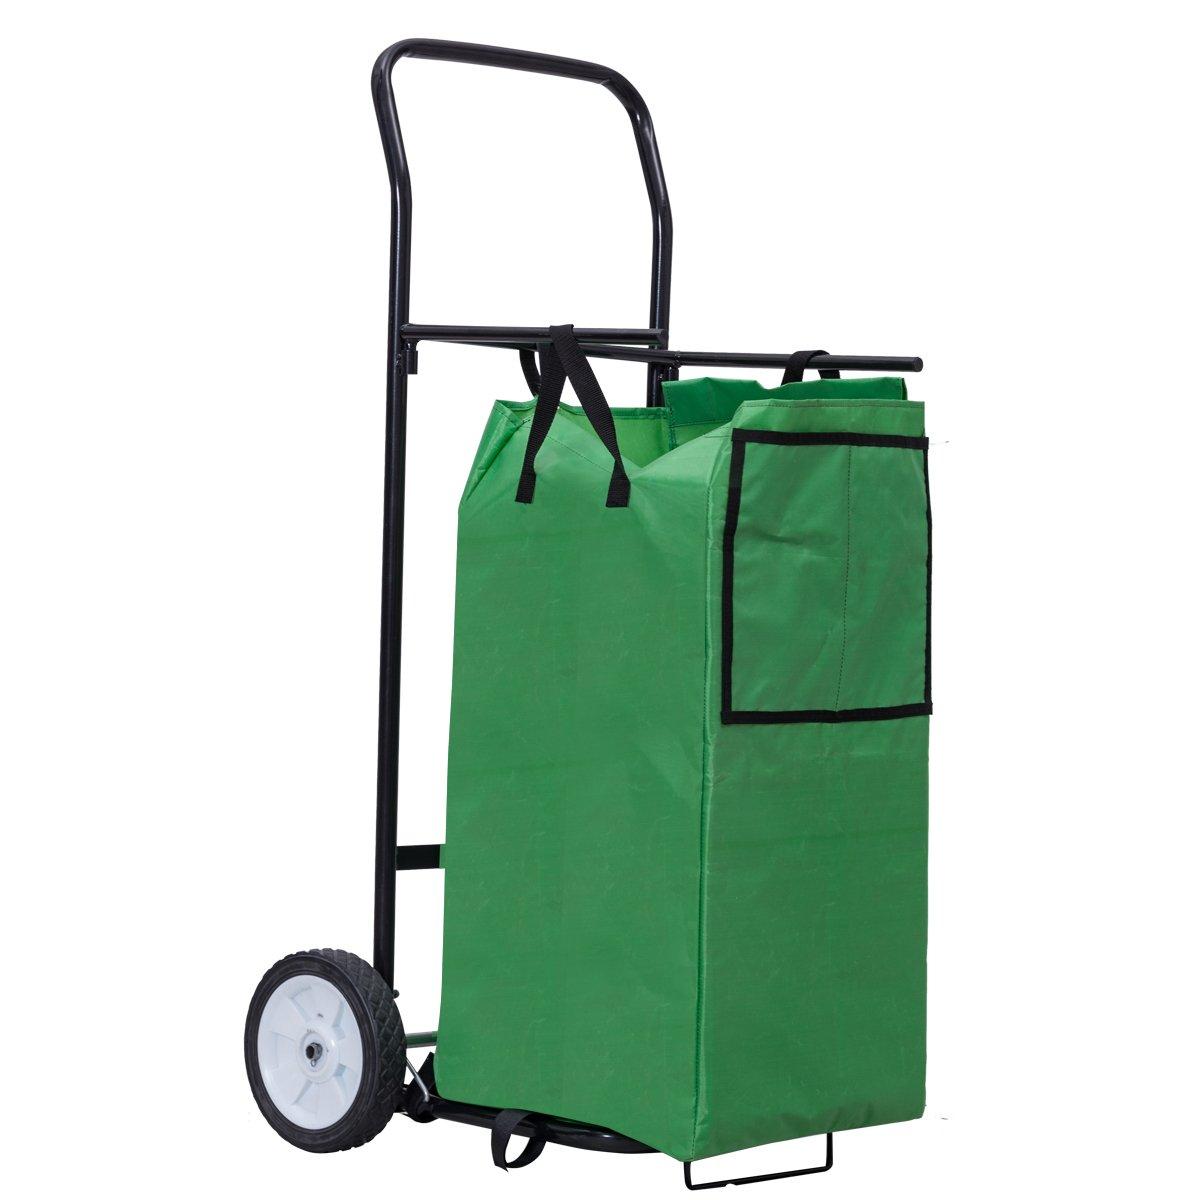 Goplus Portable Gardening Lawn Leaf Bag Detachable Tote Cart Multifunctional Folding Basket w/ Pocket Green